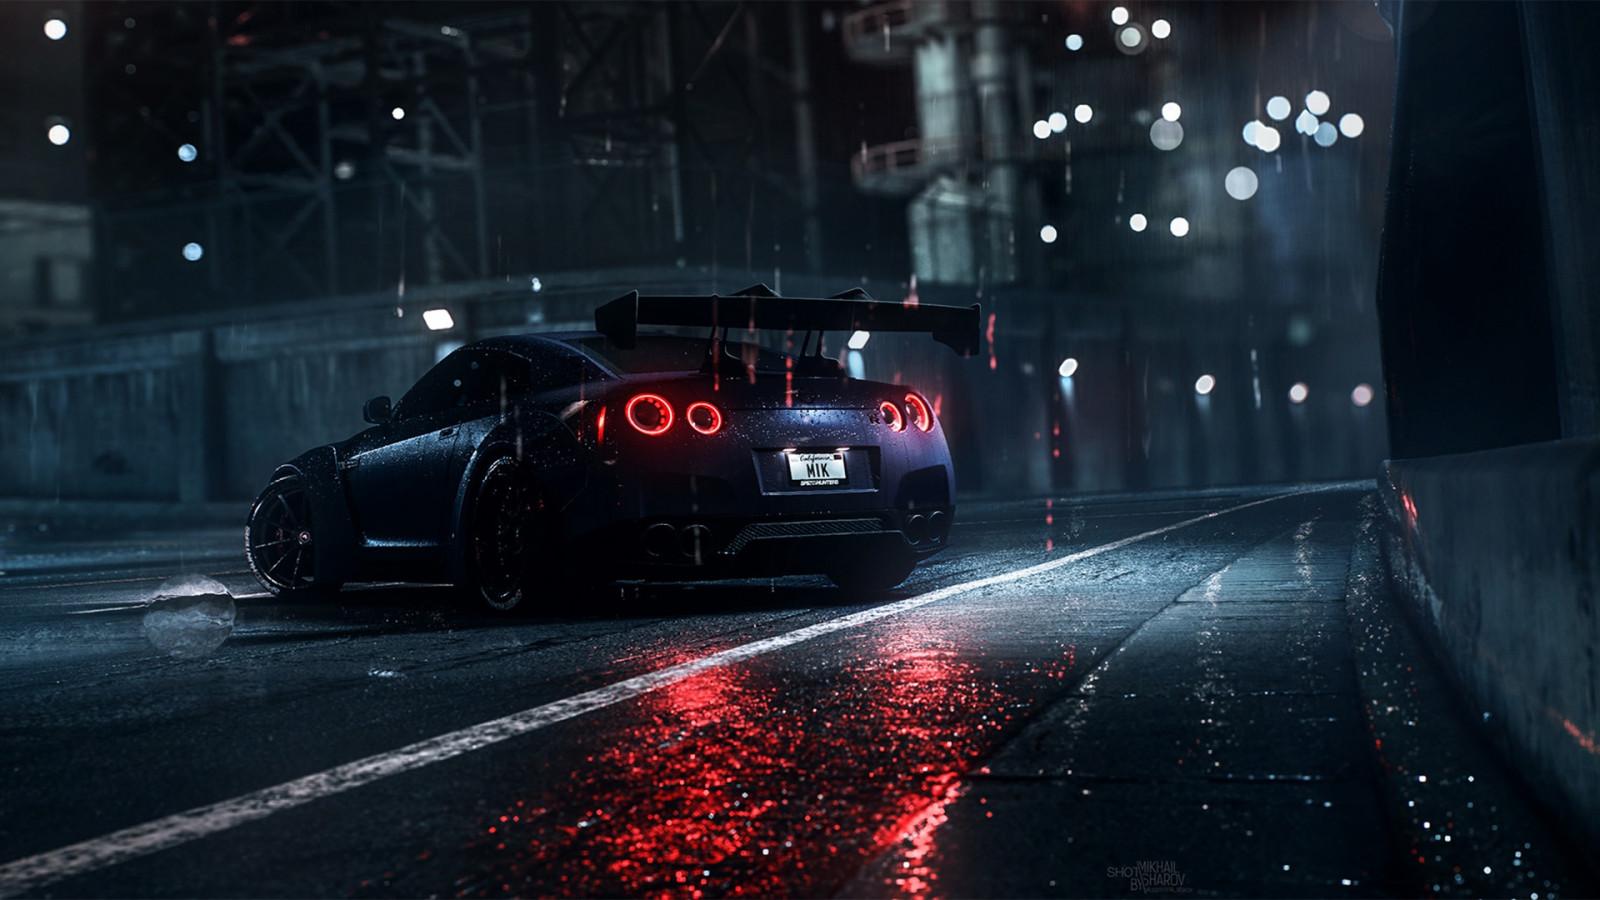 Fondos de pantalla : oscuro, noche, lluvia, coche, Nissan ...